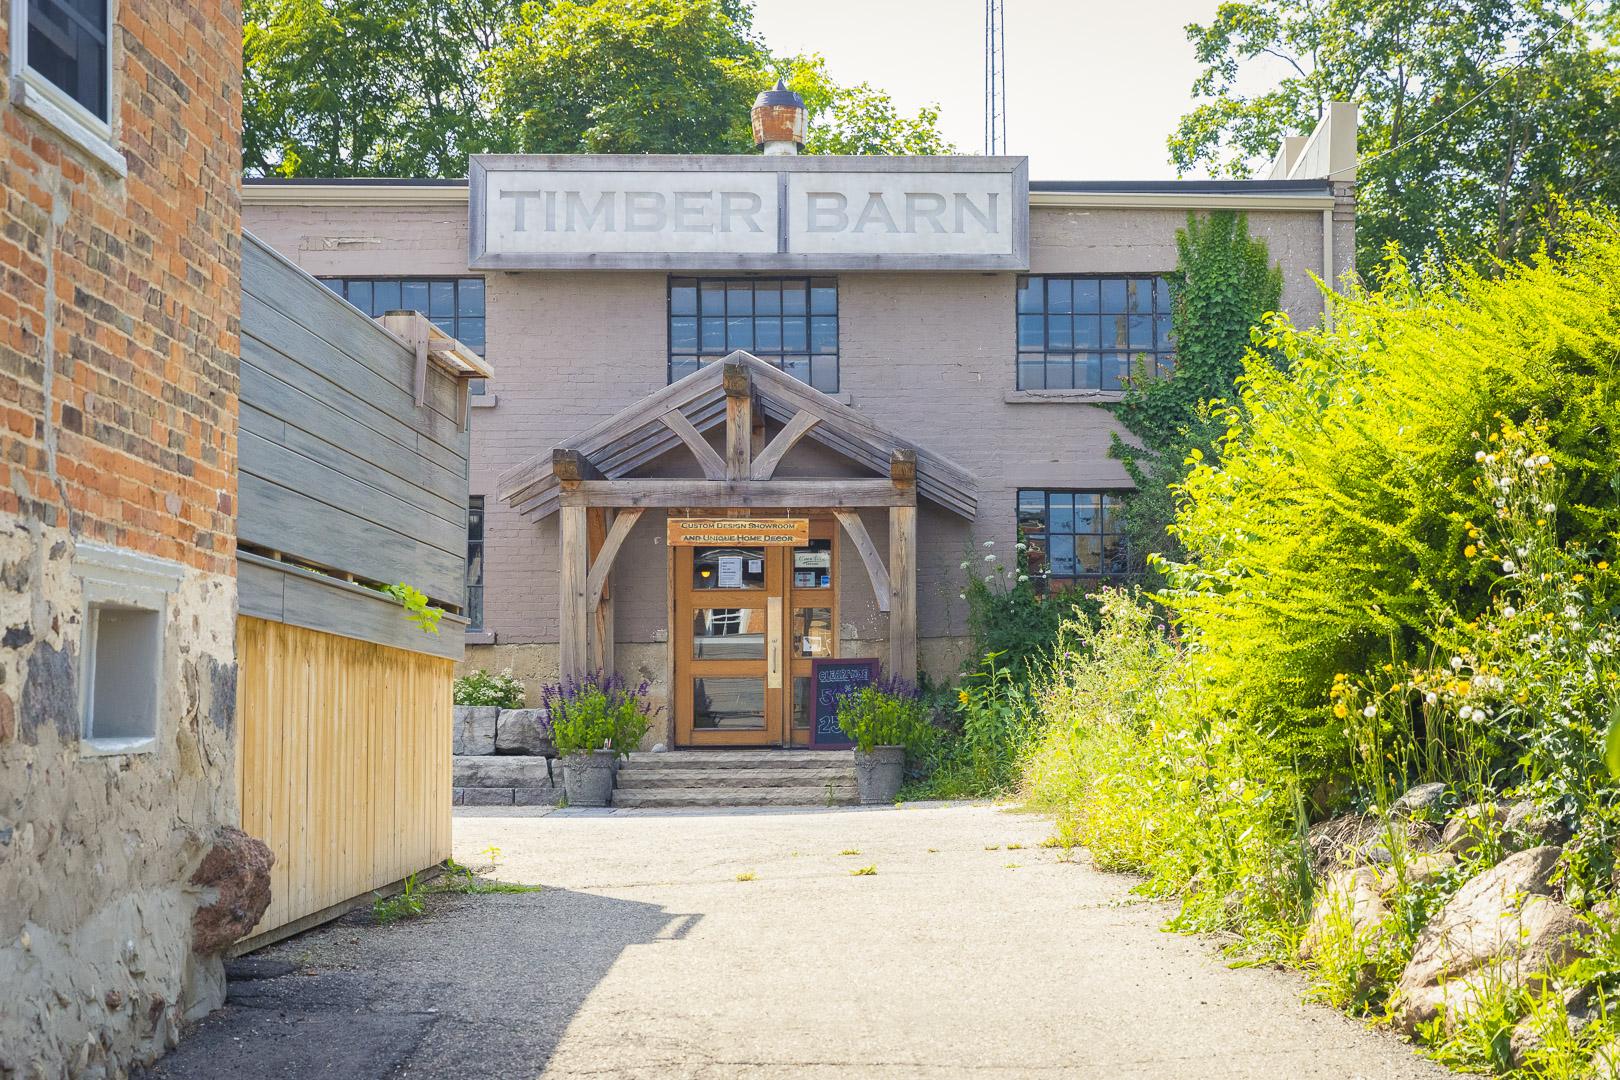 Timber Farm